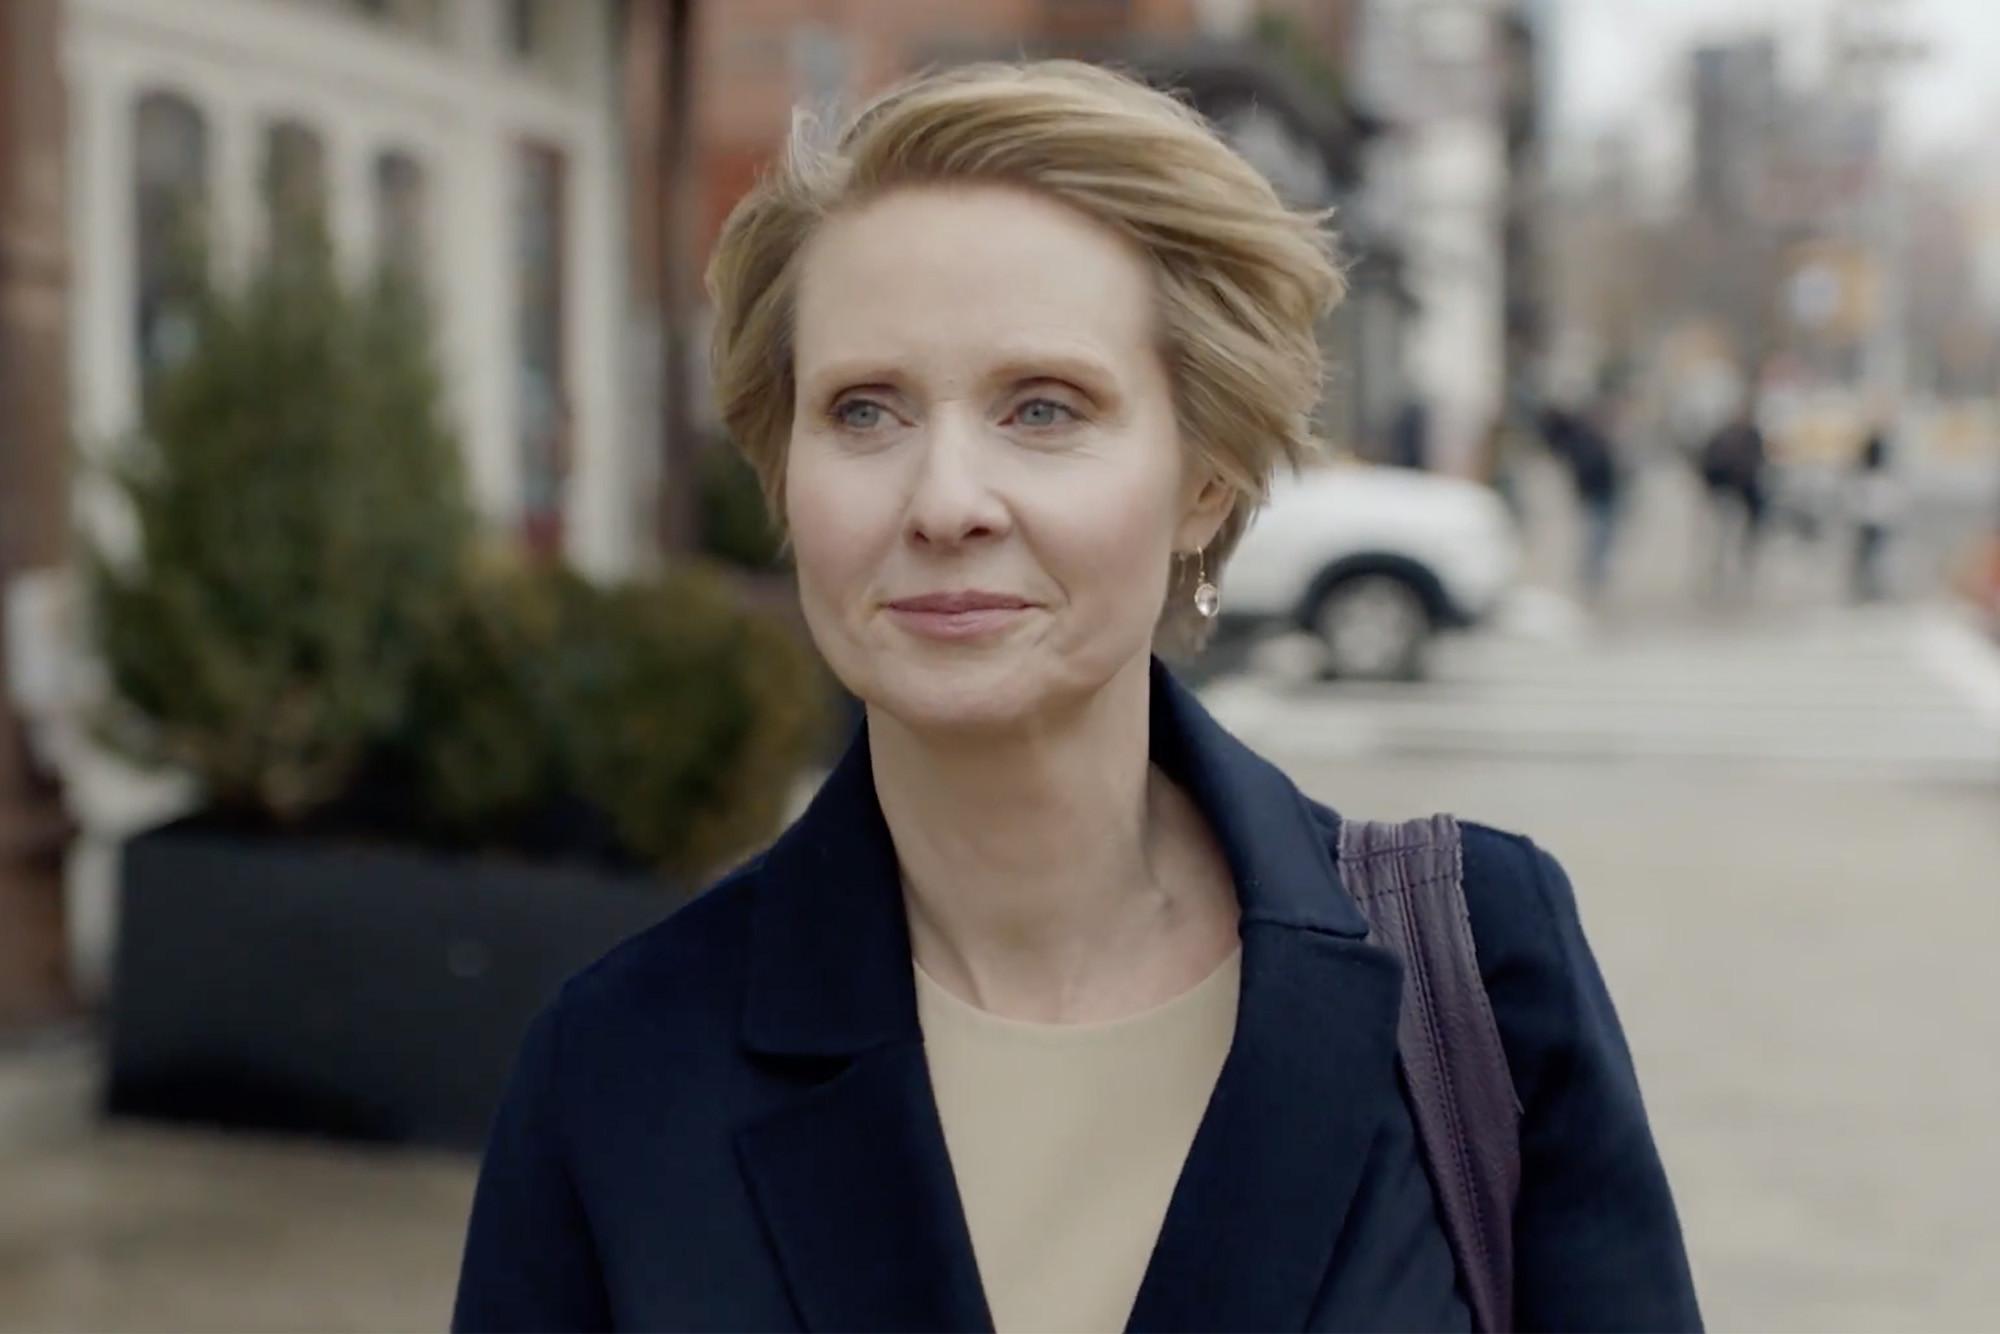 Sex and the city star cynthia nixon announces new york gubernatorial bid